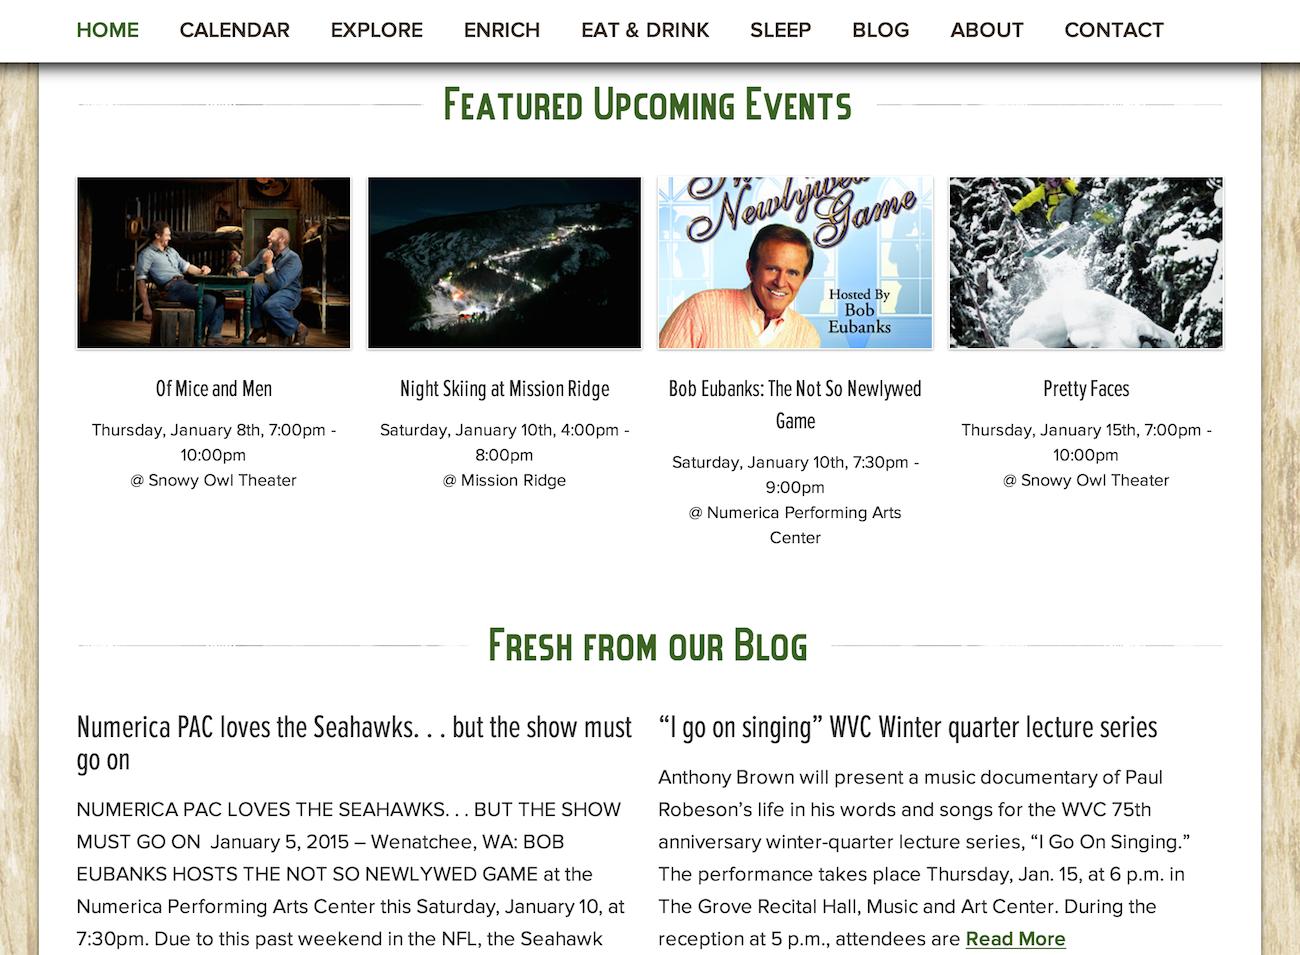 showcase - Wenatchee - home page featured